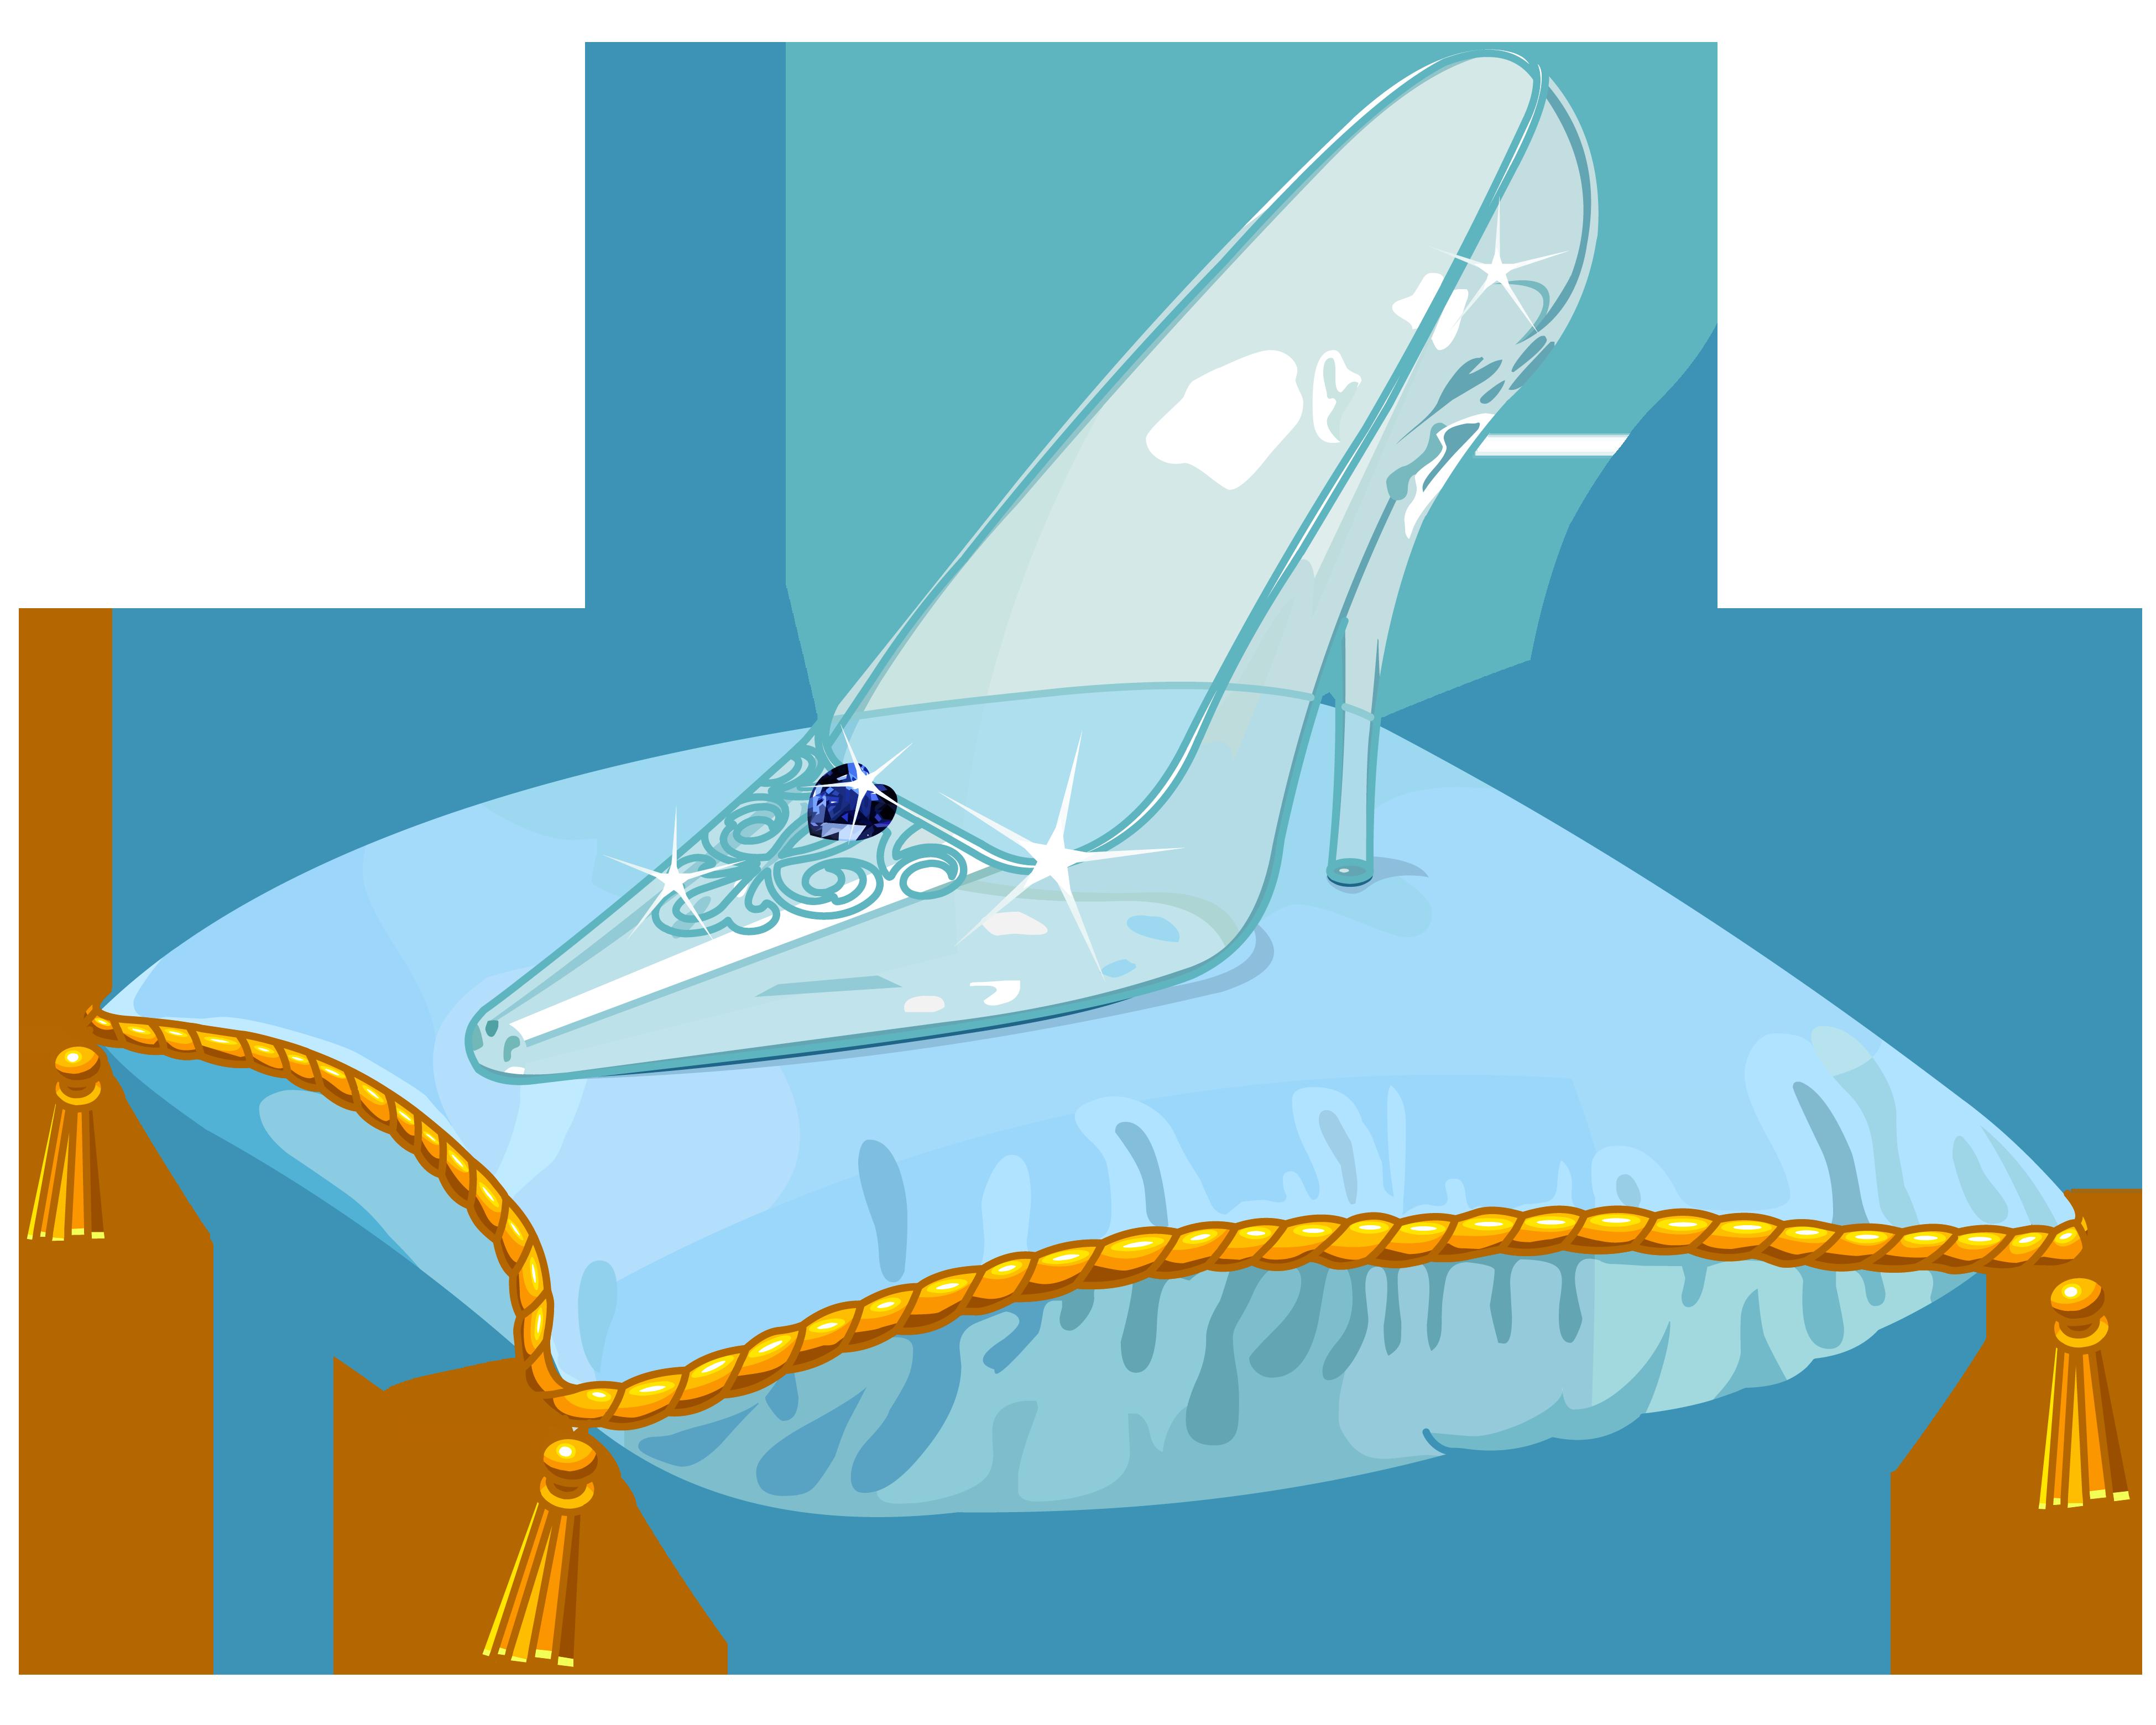 x glass slipper. Heels clipart cinderella